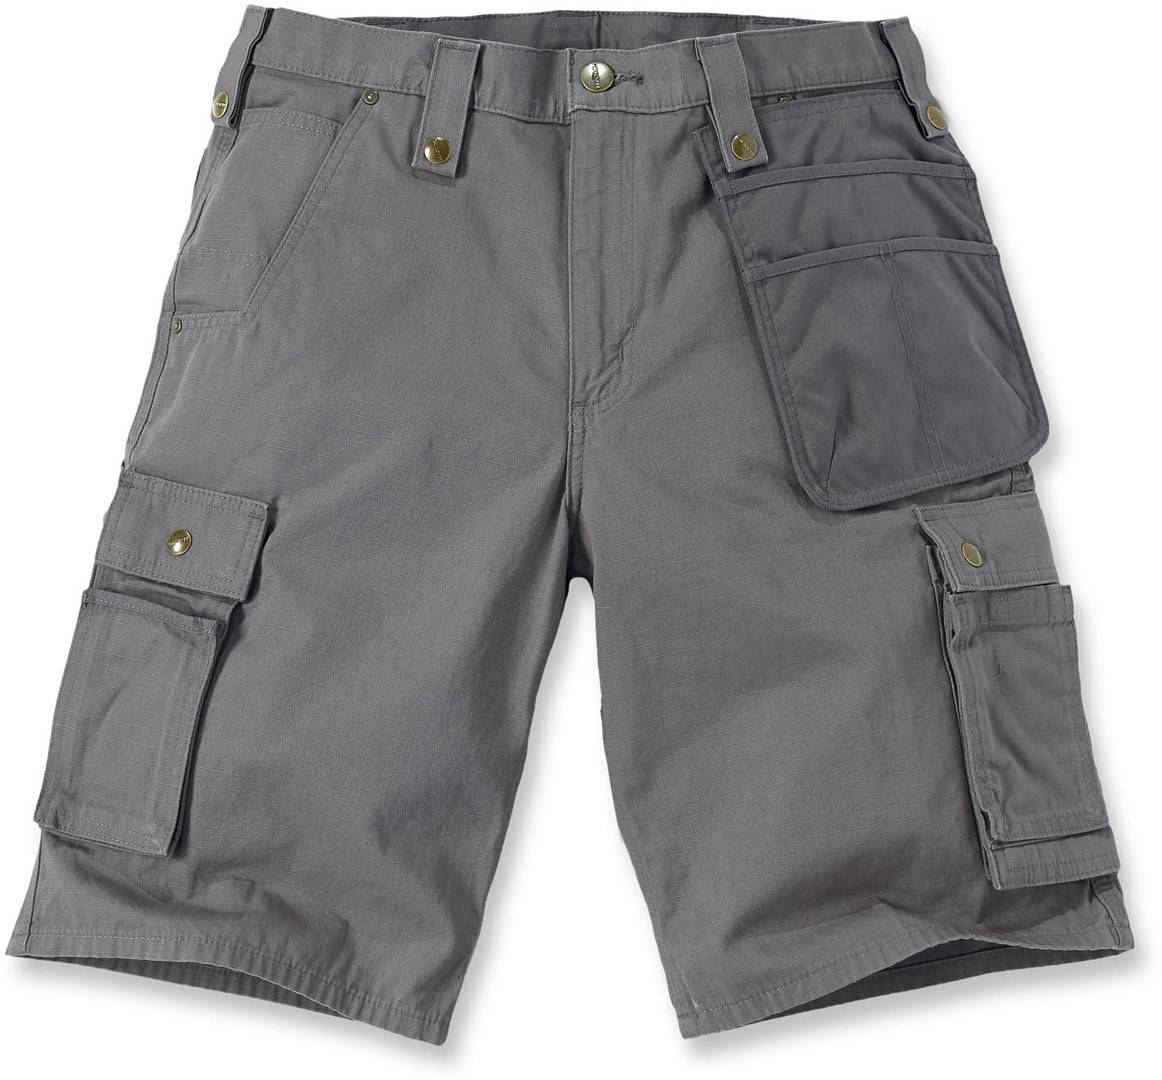 Carhartt Multi Pocket Ripstop Pantalones cortos Gris 40